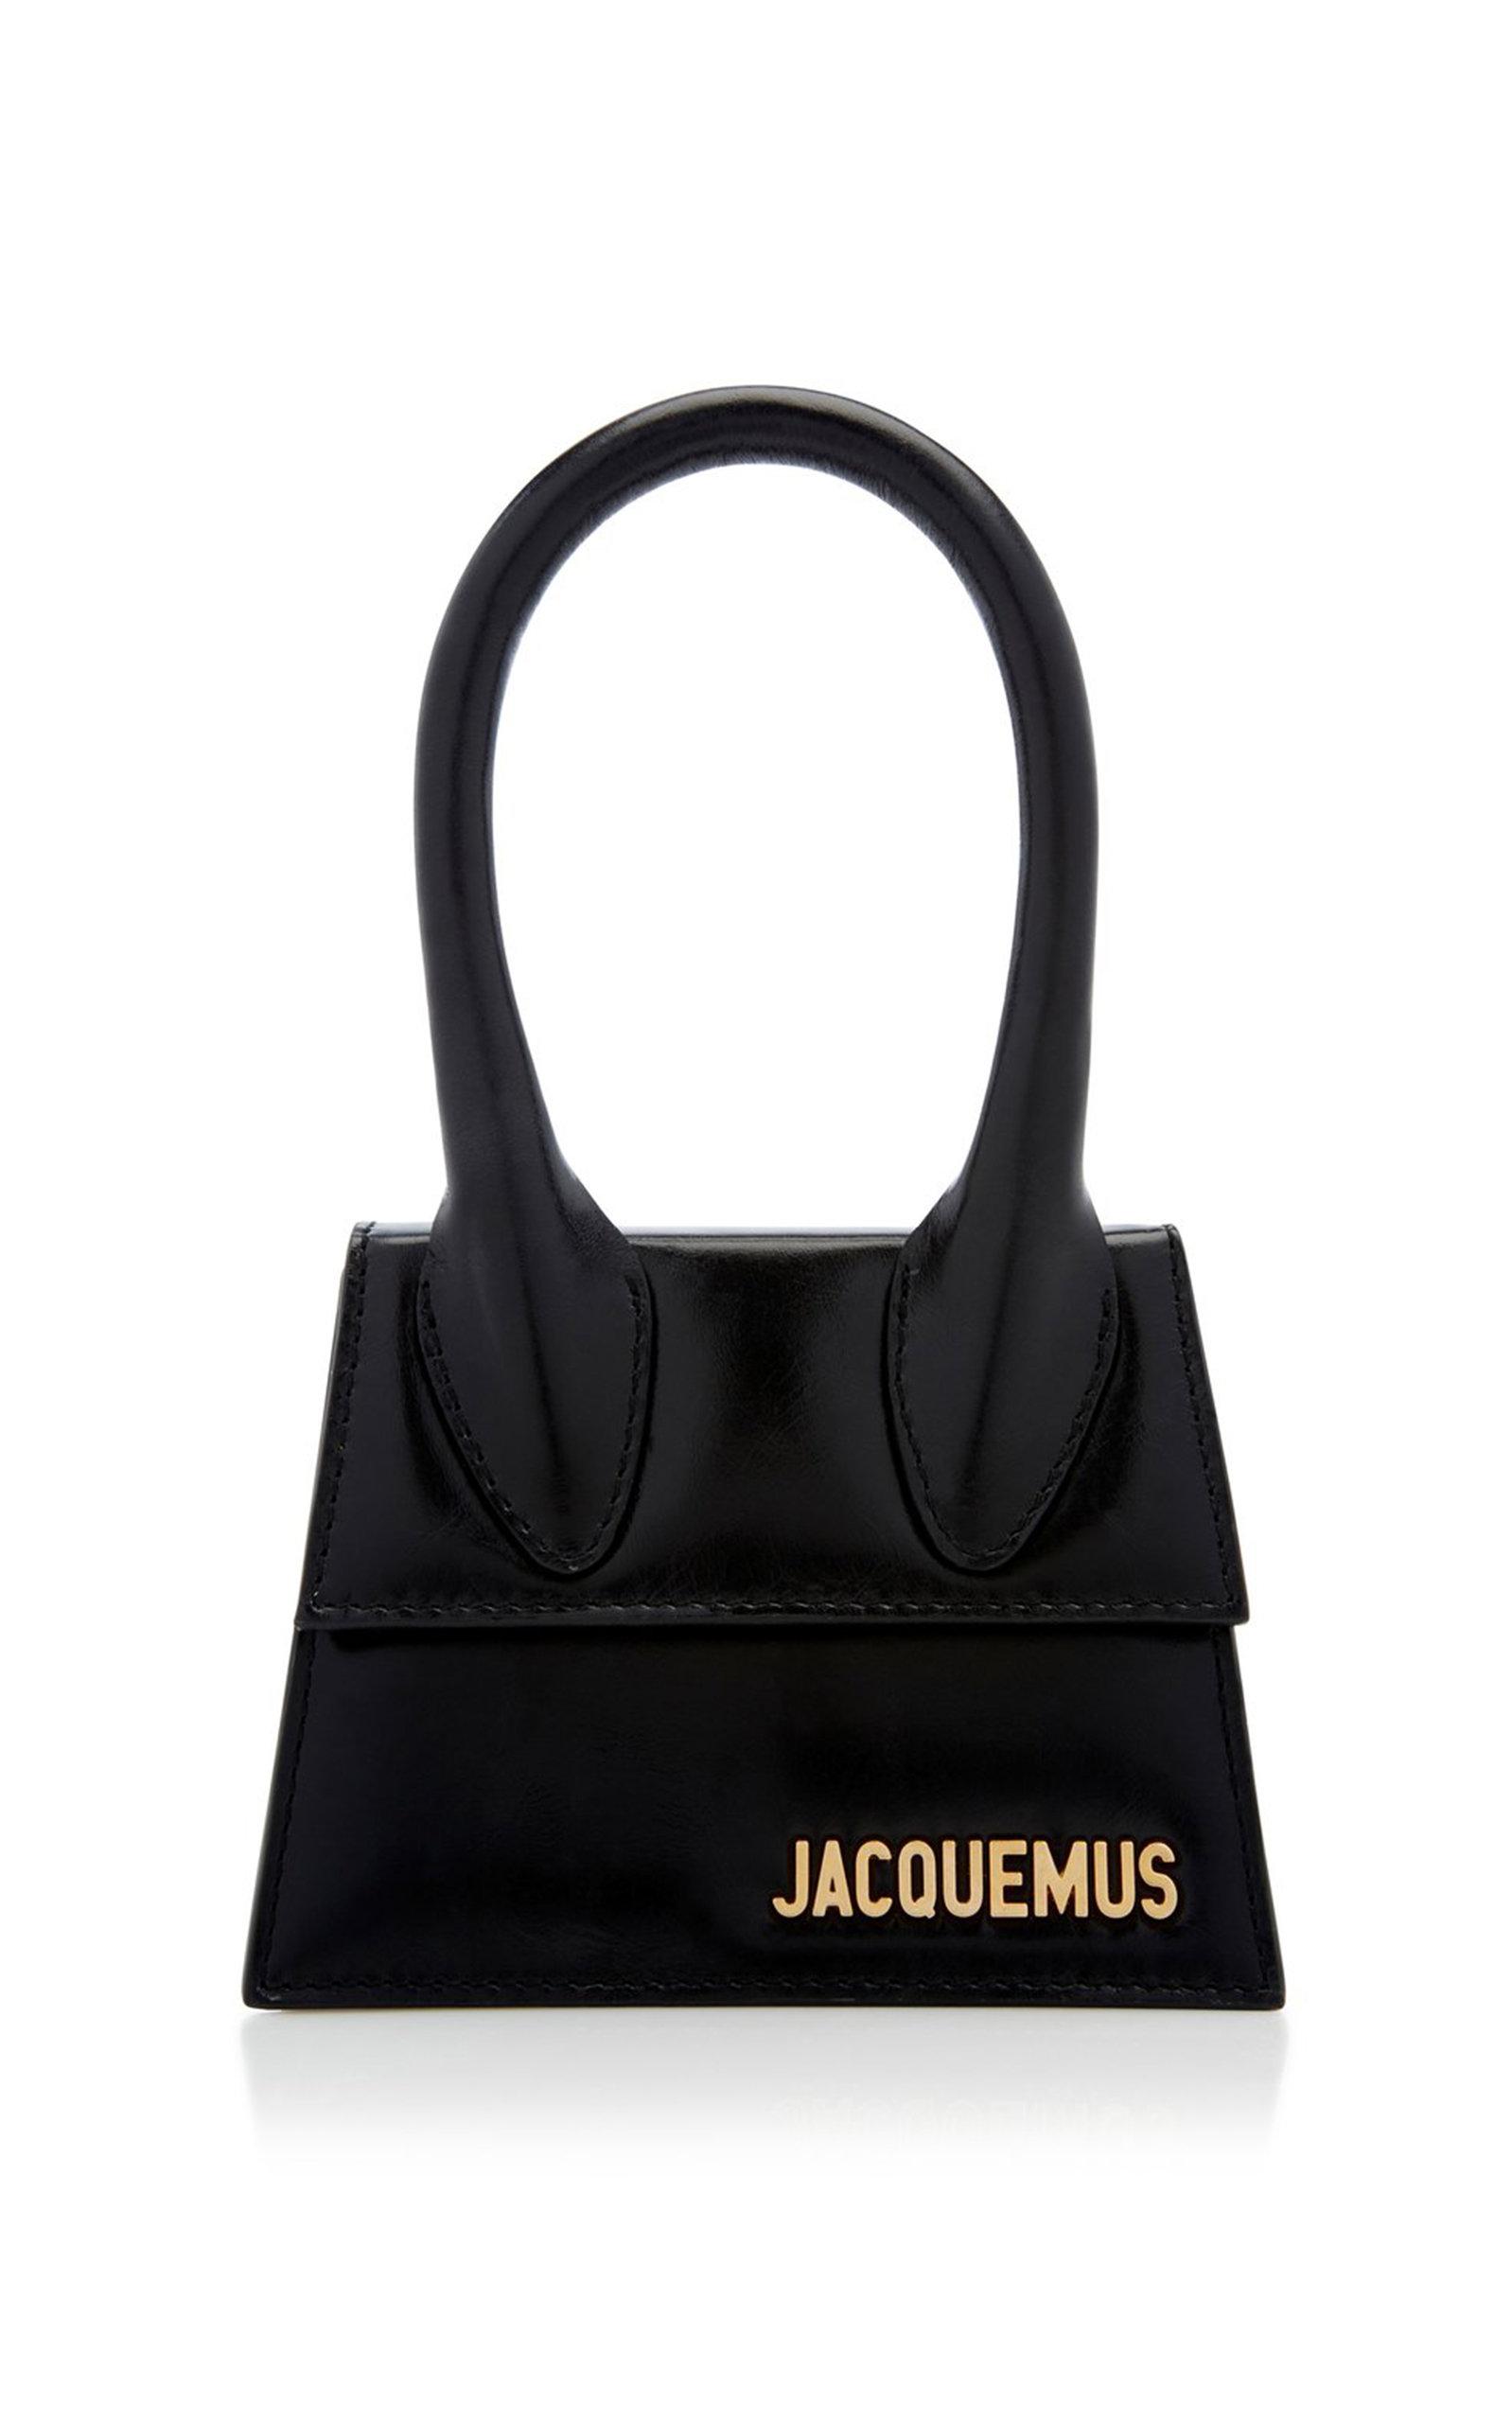 a68d0835e9 Jacquemus Le Sac Chiquito Leather Bag Size Os Women Black